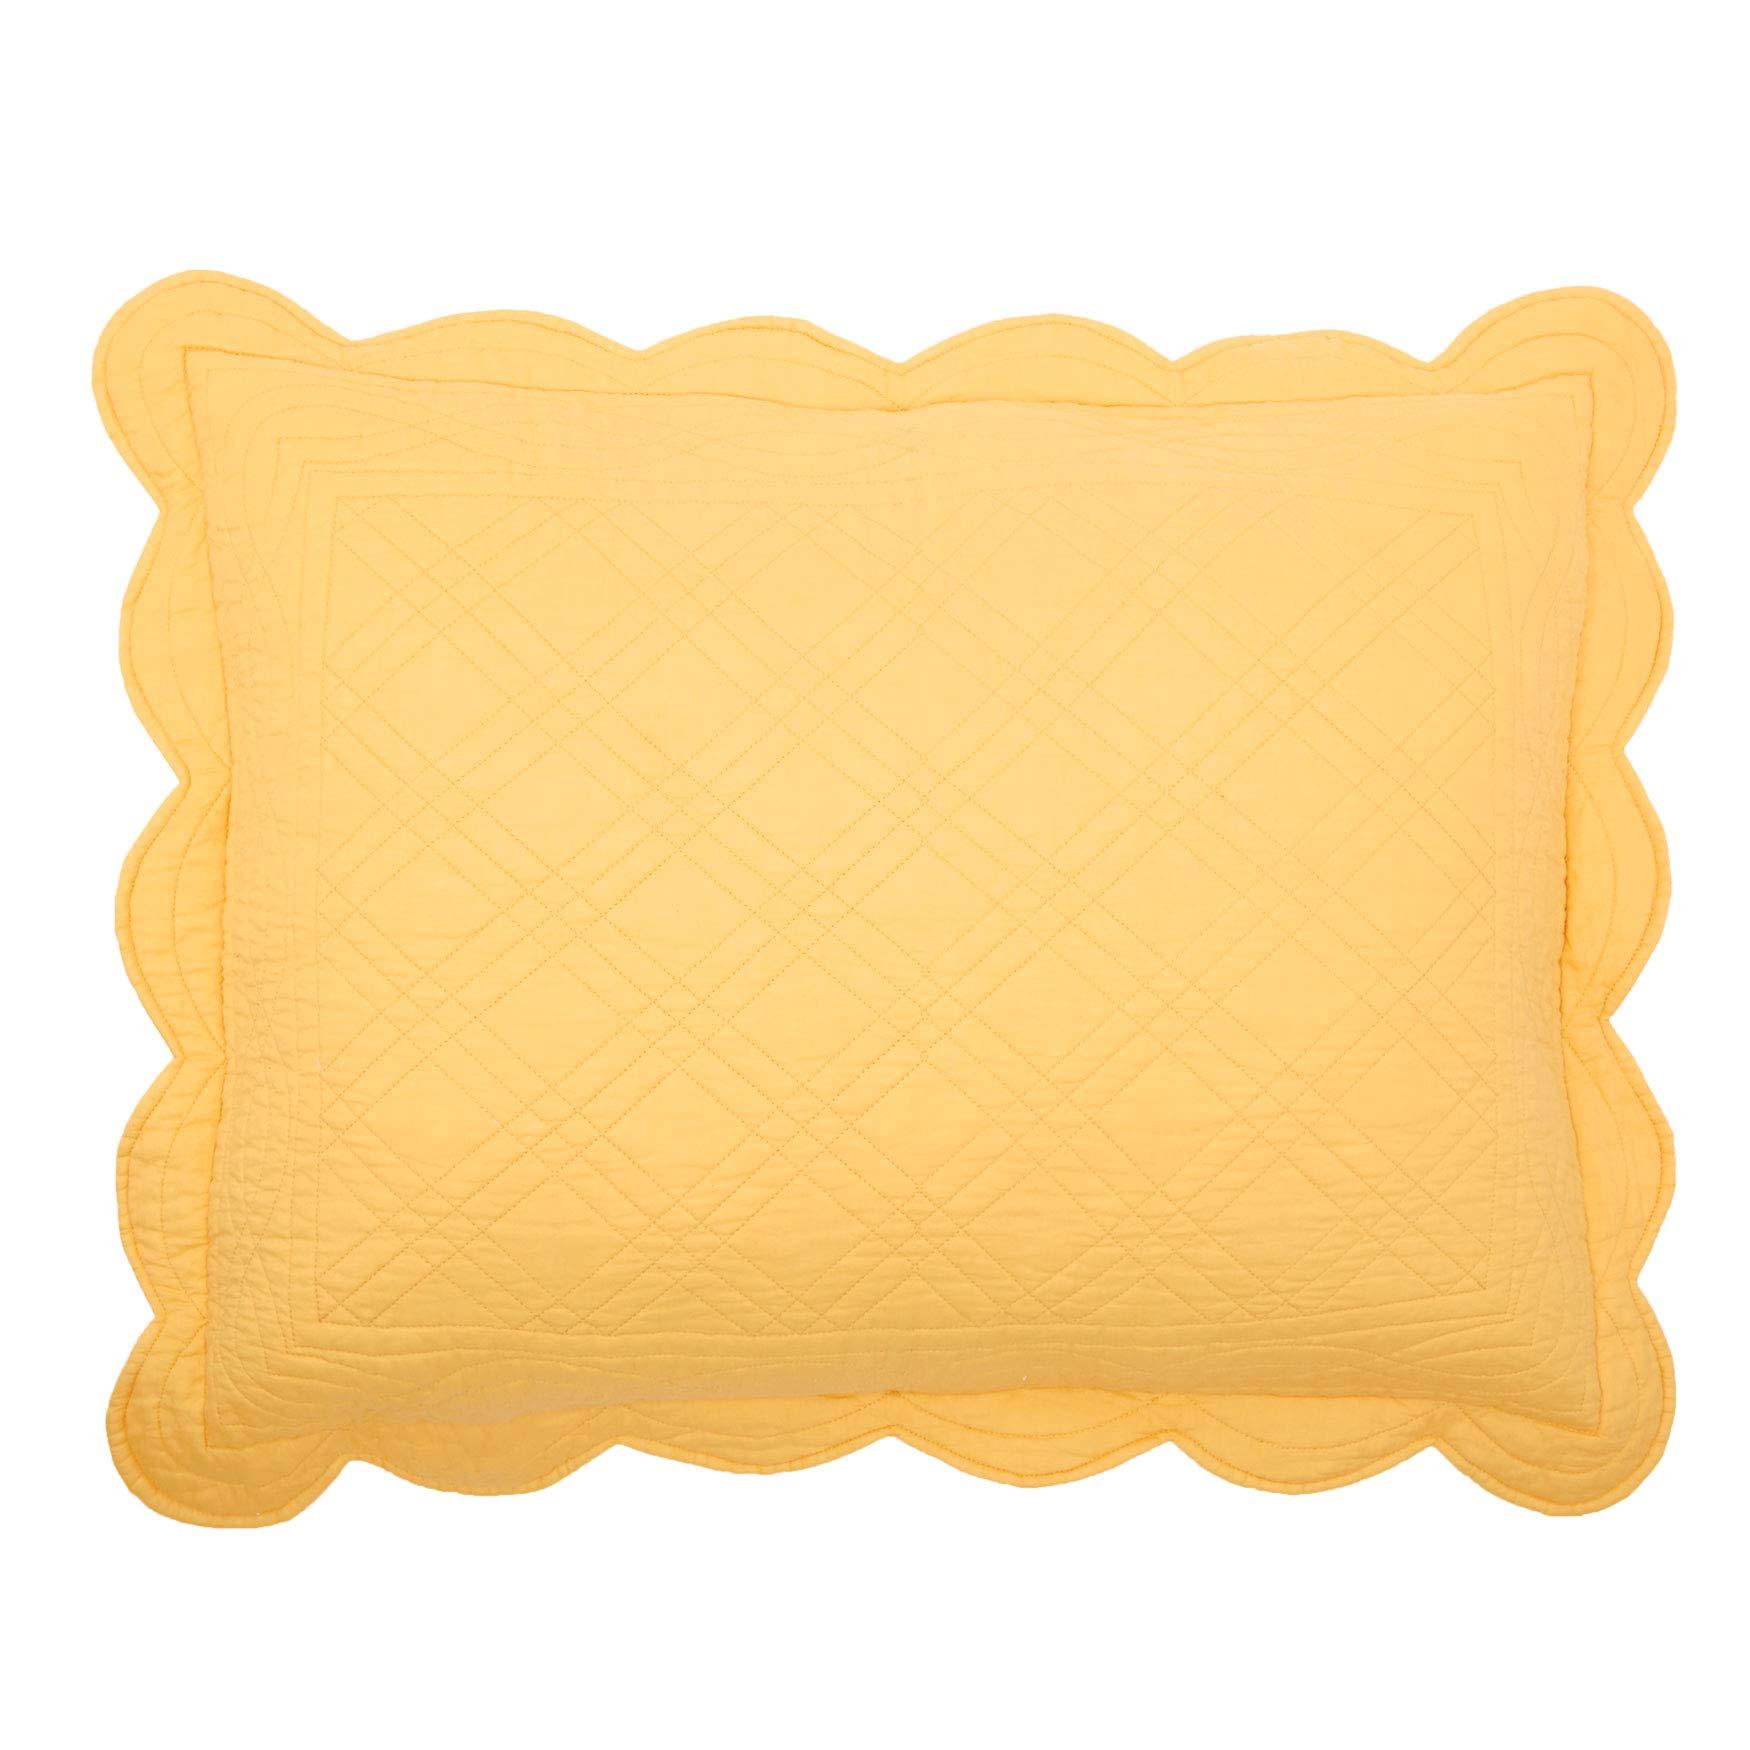 BrylaneHome Florence Sham - Dandelion Yellow, Stand